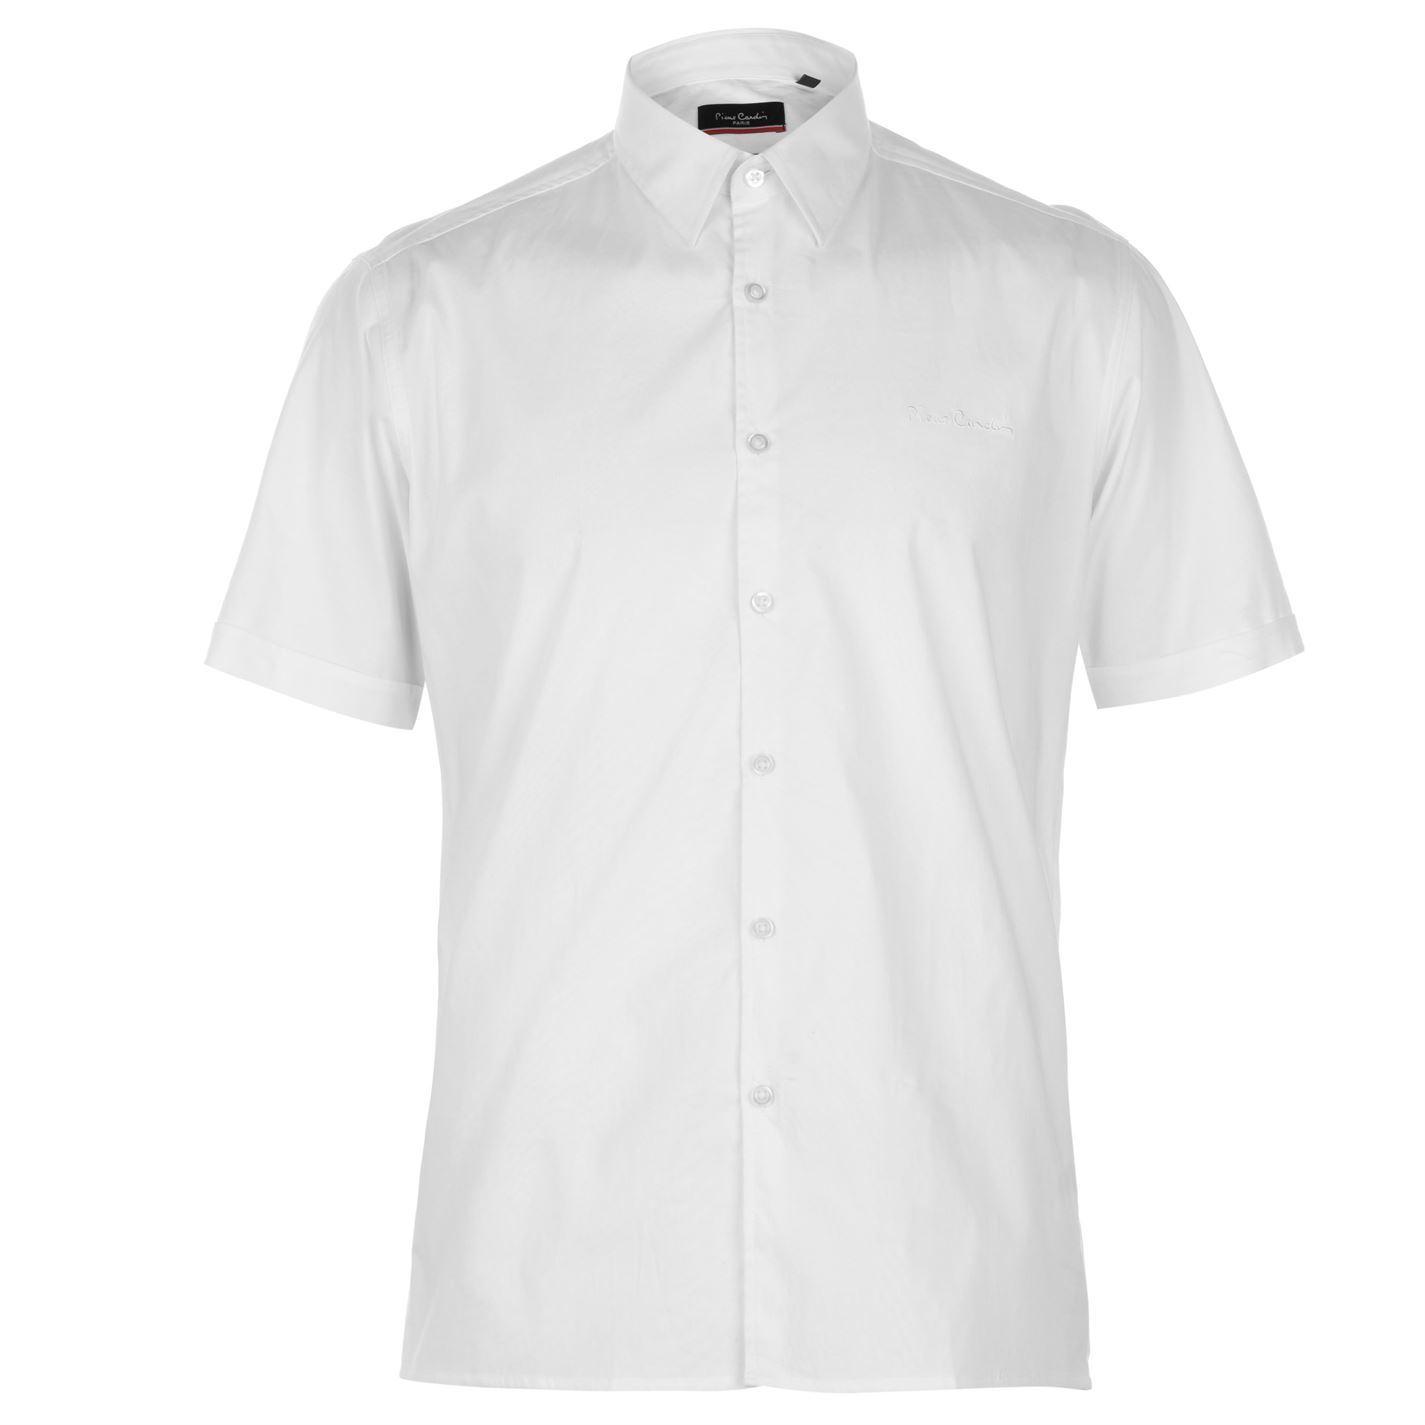 Pierre-Cardin-Mens-Slim-Fit-Short-Sleeve-Shirt-Casual